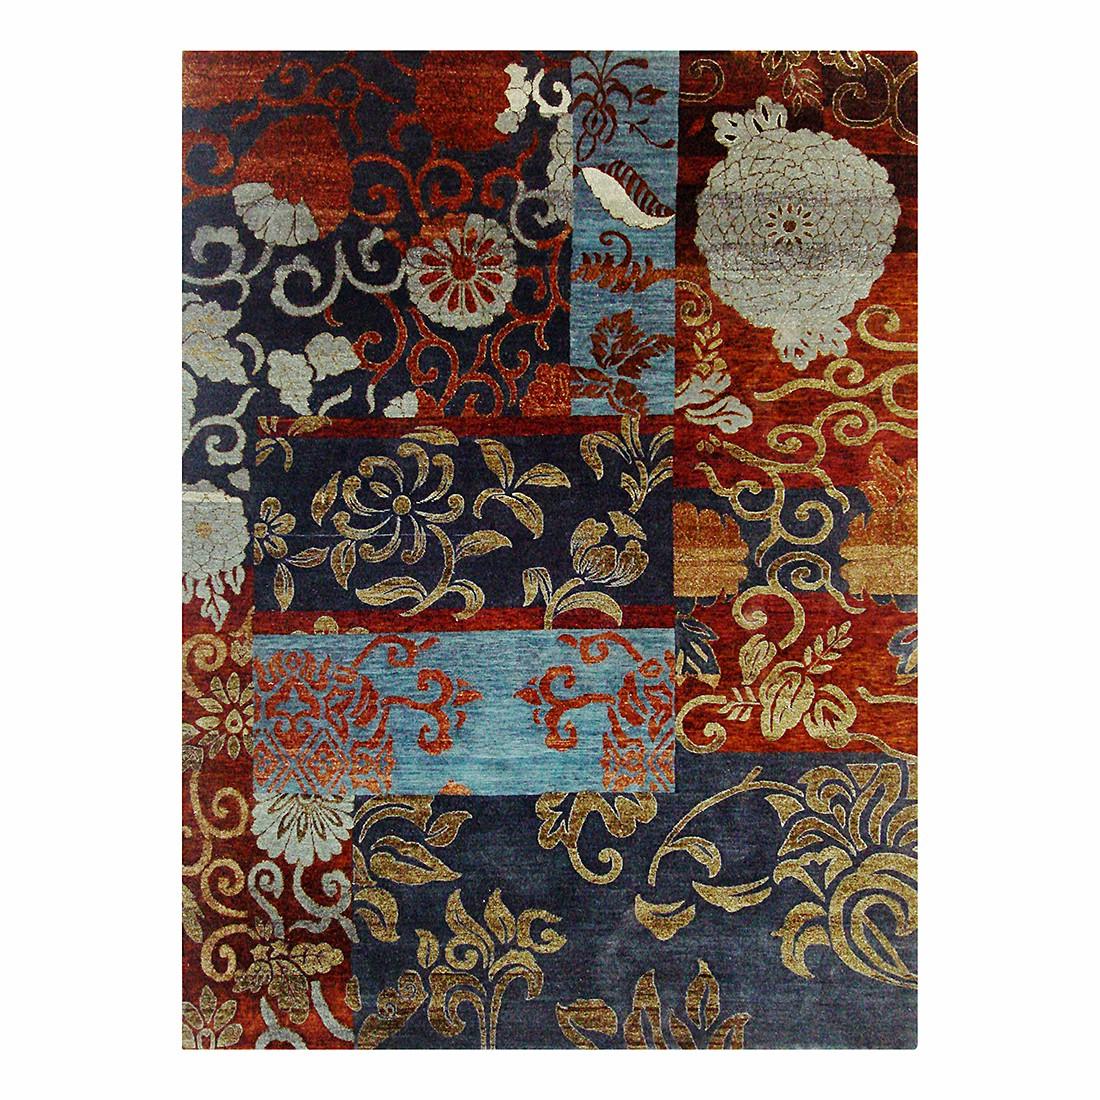 Teppich Lombard Premium – Wolle/Multicolor – 160 x 90 cm, Talis Teppiche jetzt kaufen